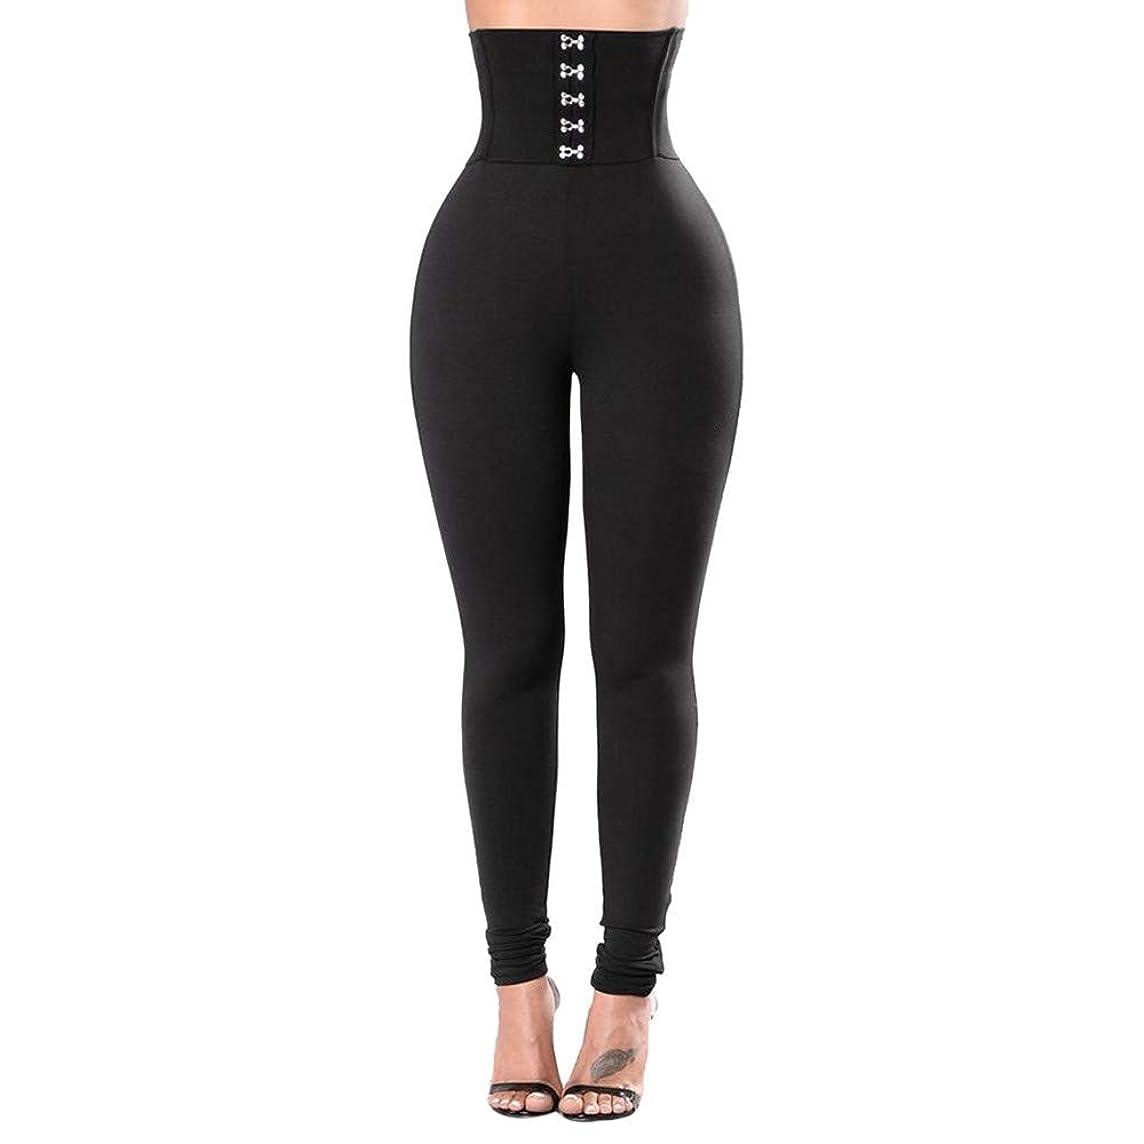 Women's Sports Gym Yoga Running Fitness Leggings Pants Yoga Clothes Tummy Control